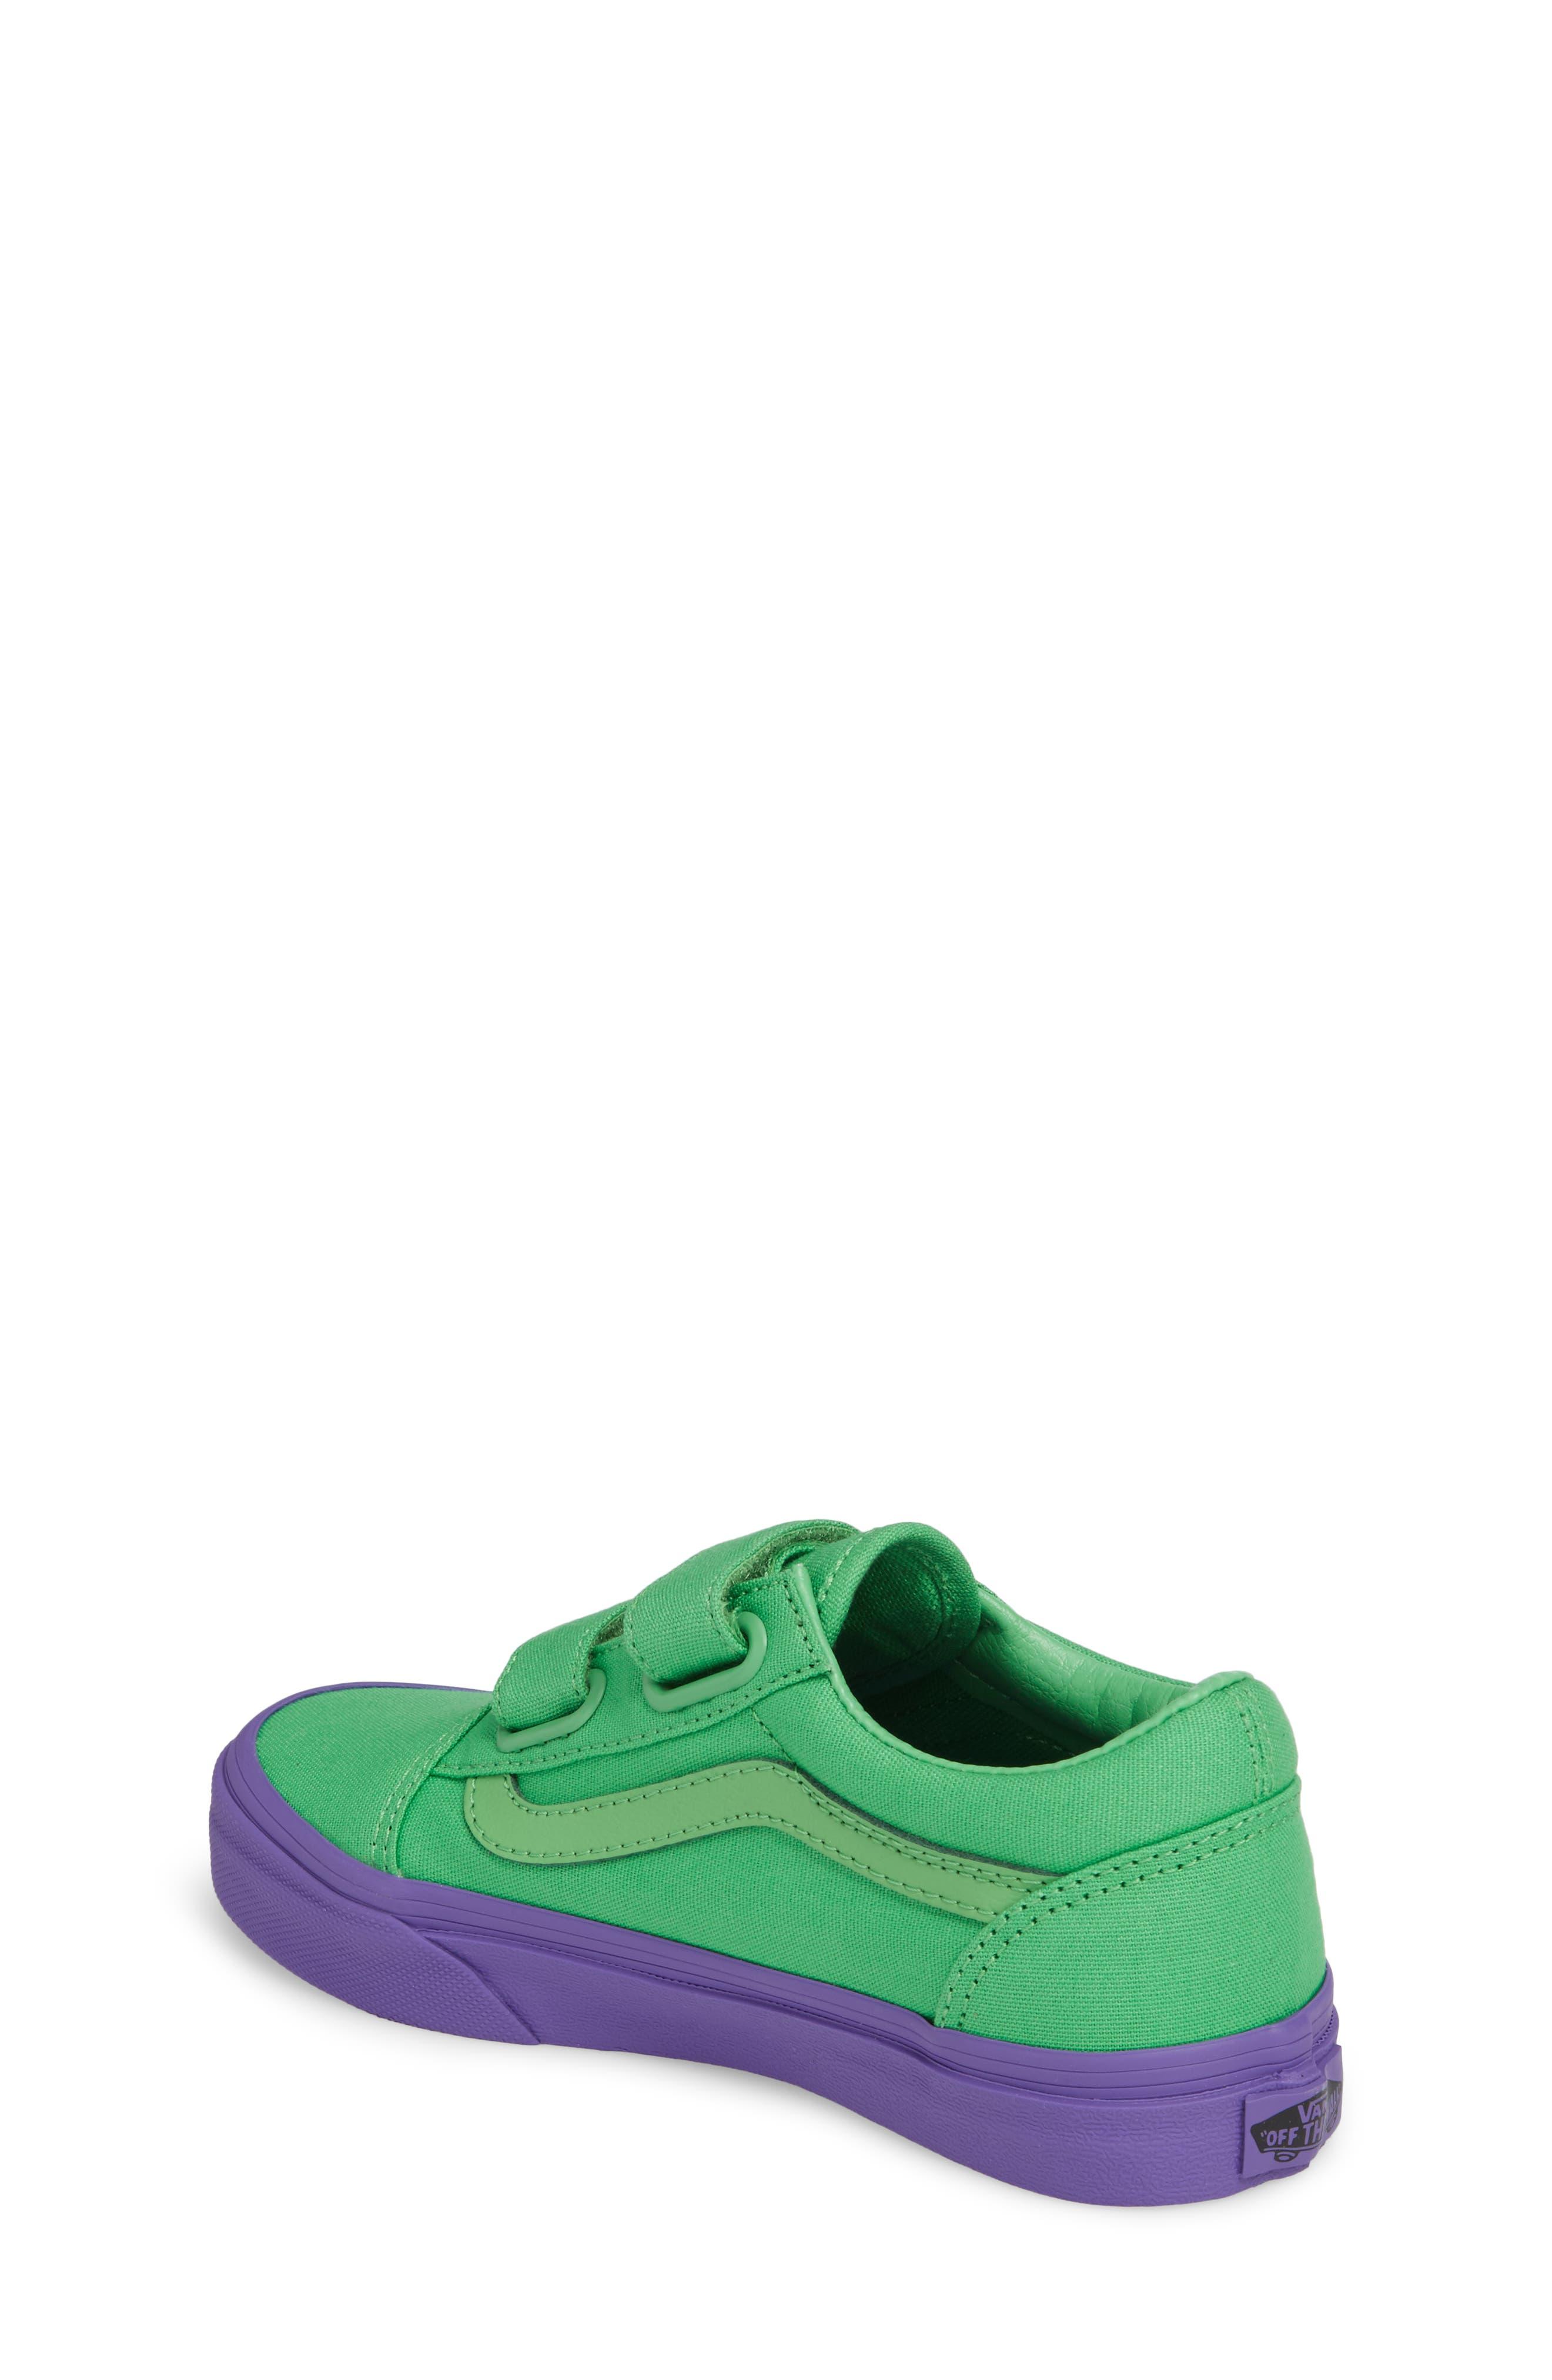 Old Skool V Sneaker,                             Alternate thumbnail 2, color,                             Green/ Purple Cosplay